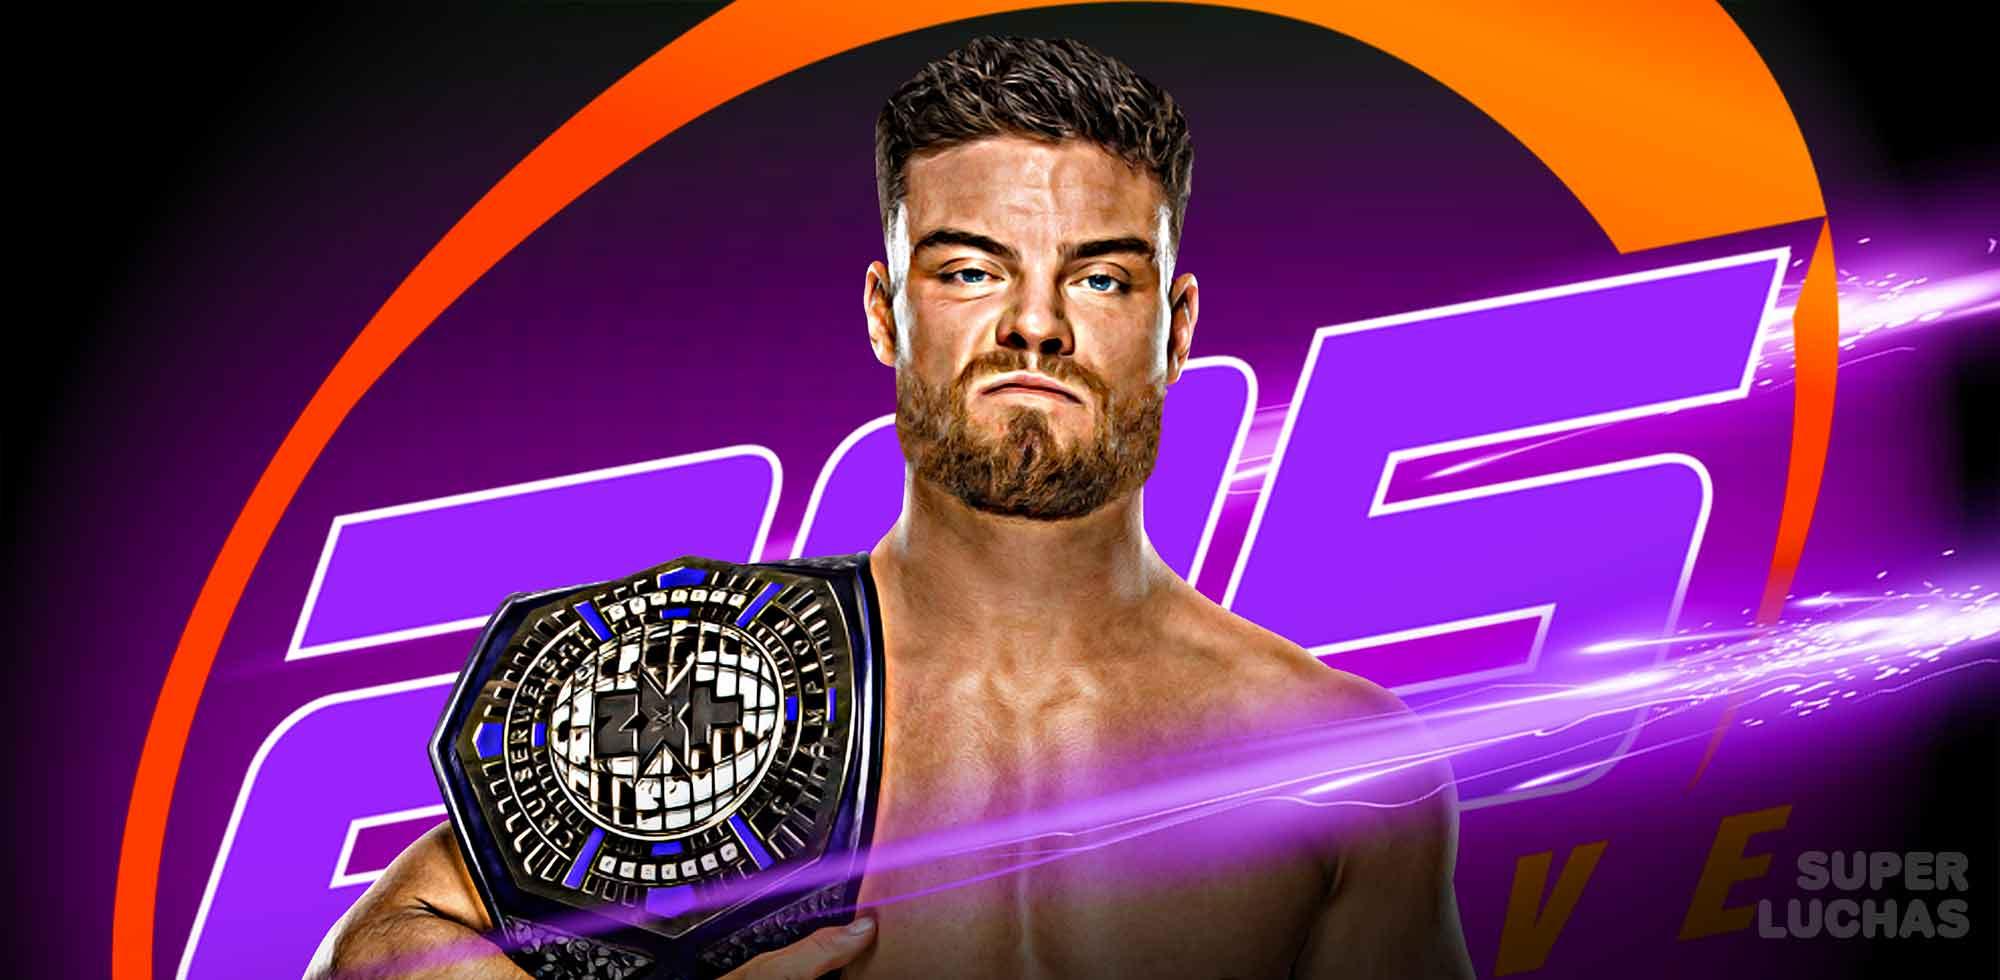 Resultados WWE 205 Live 7 de febrero 2020